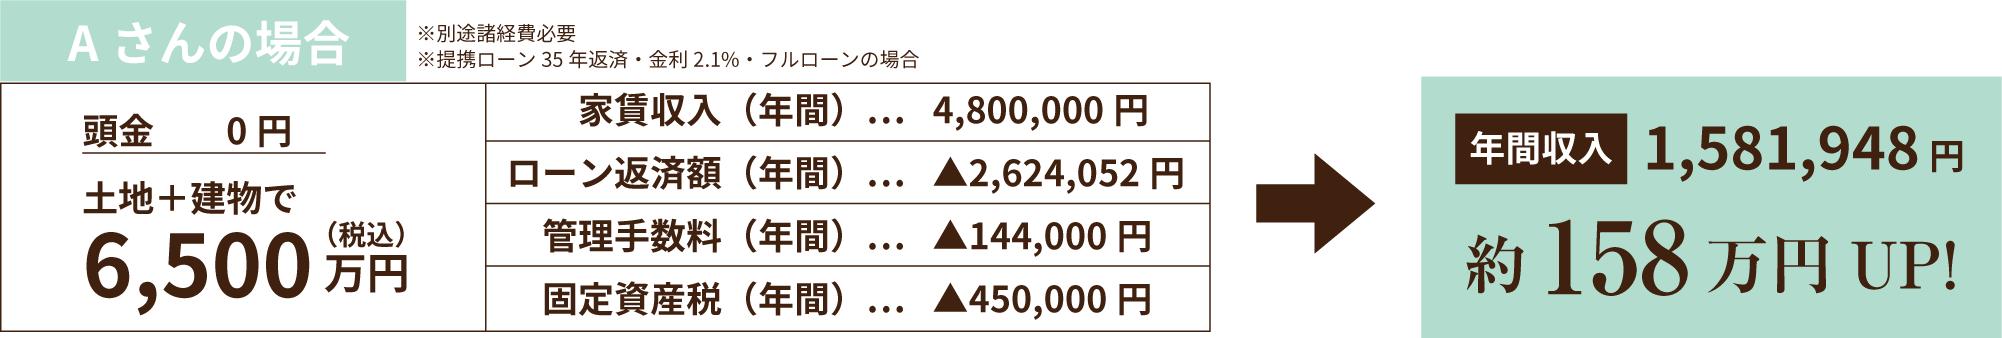 Aさんの場合 年間収入約158万円UP!